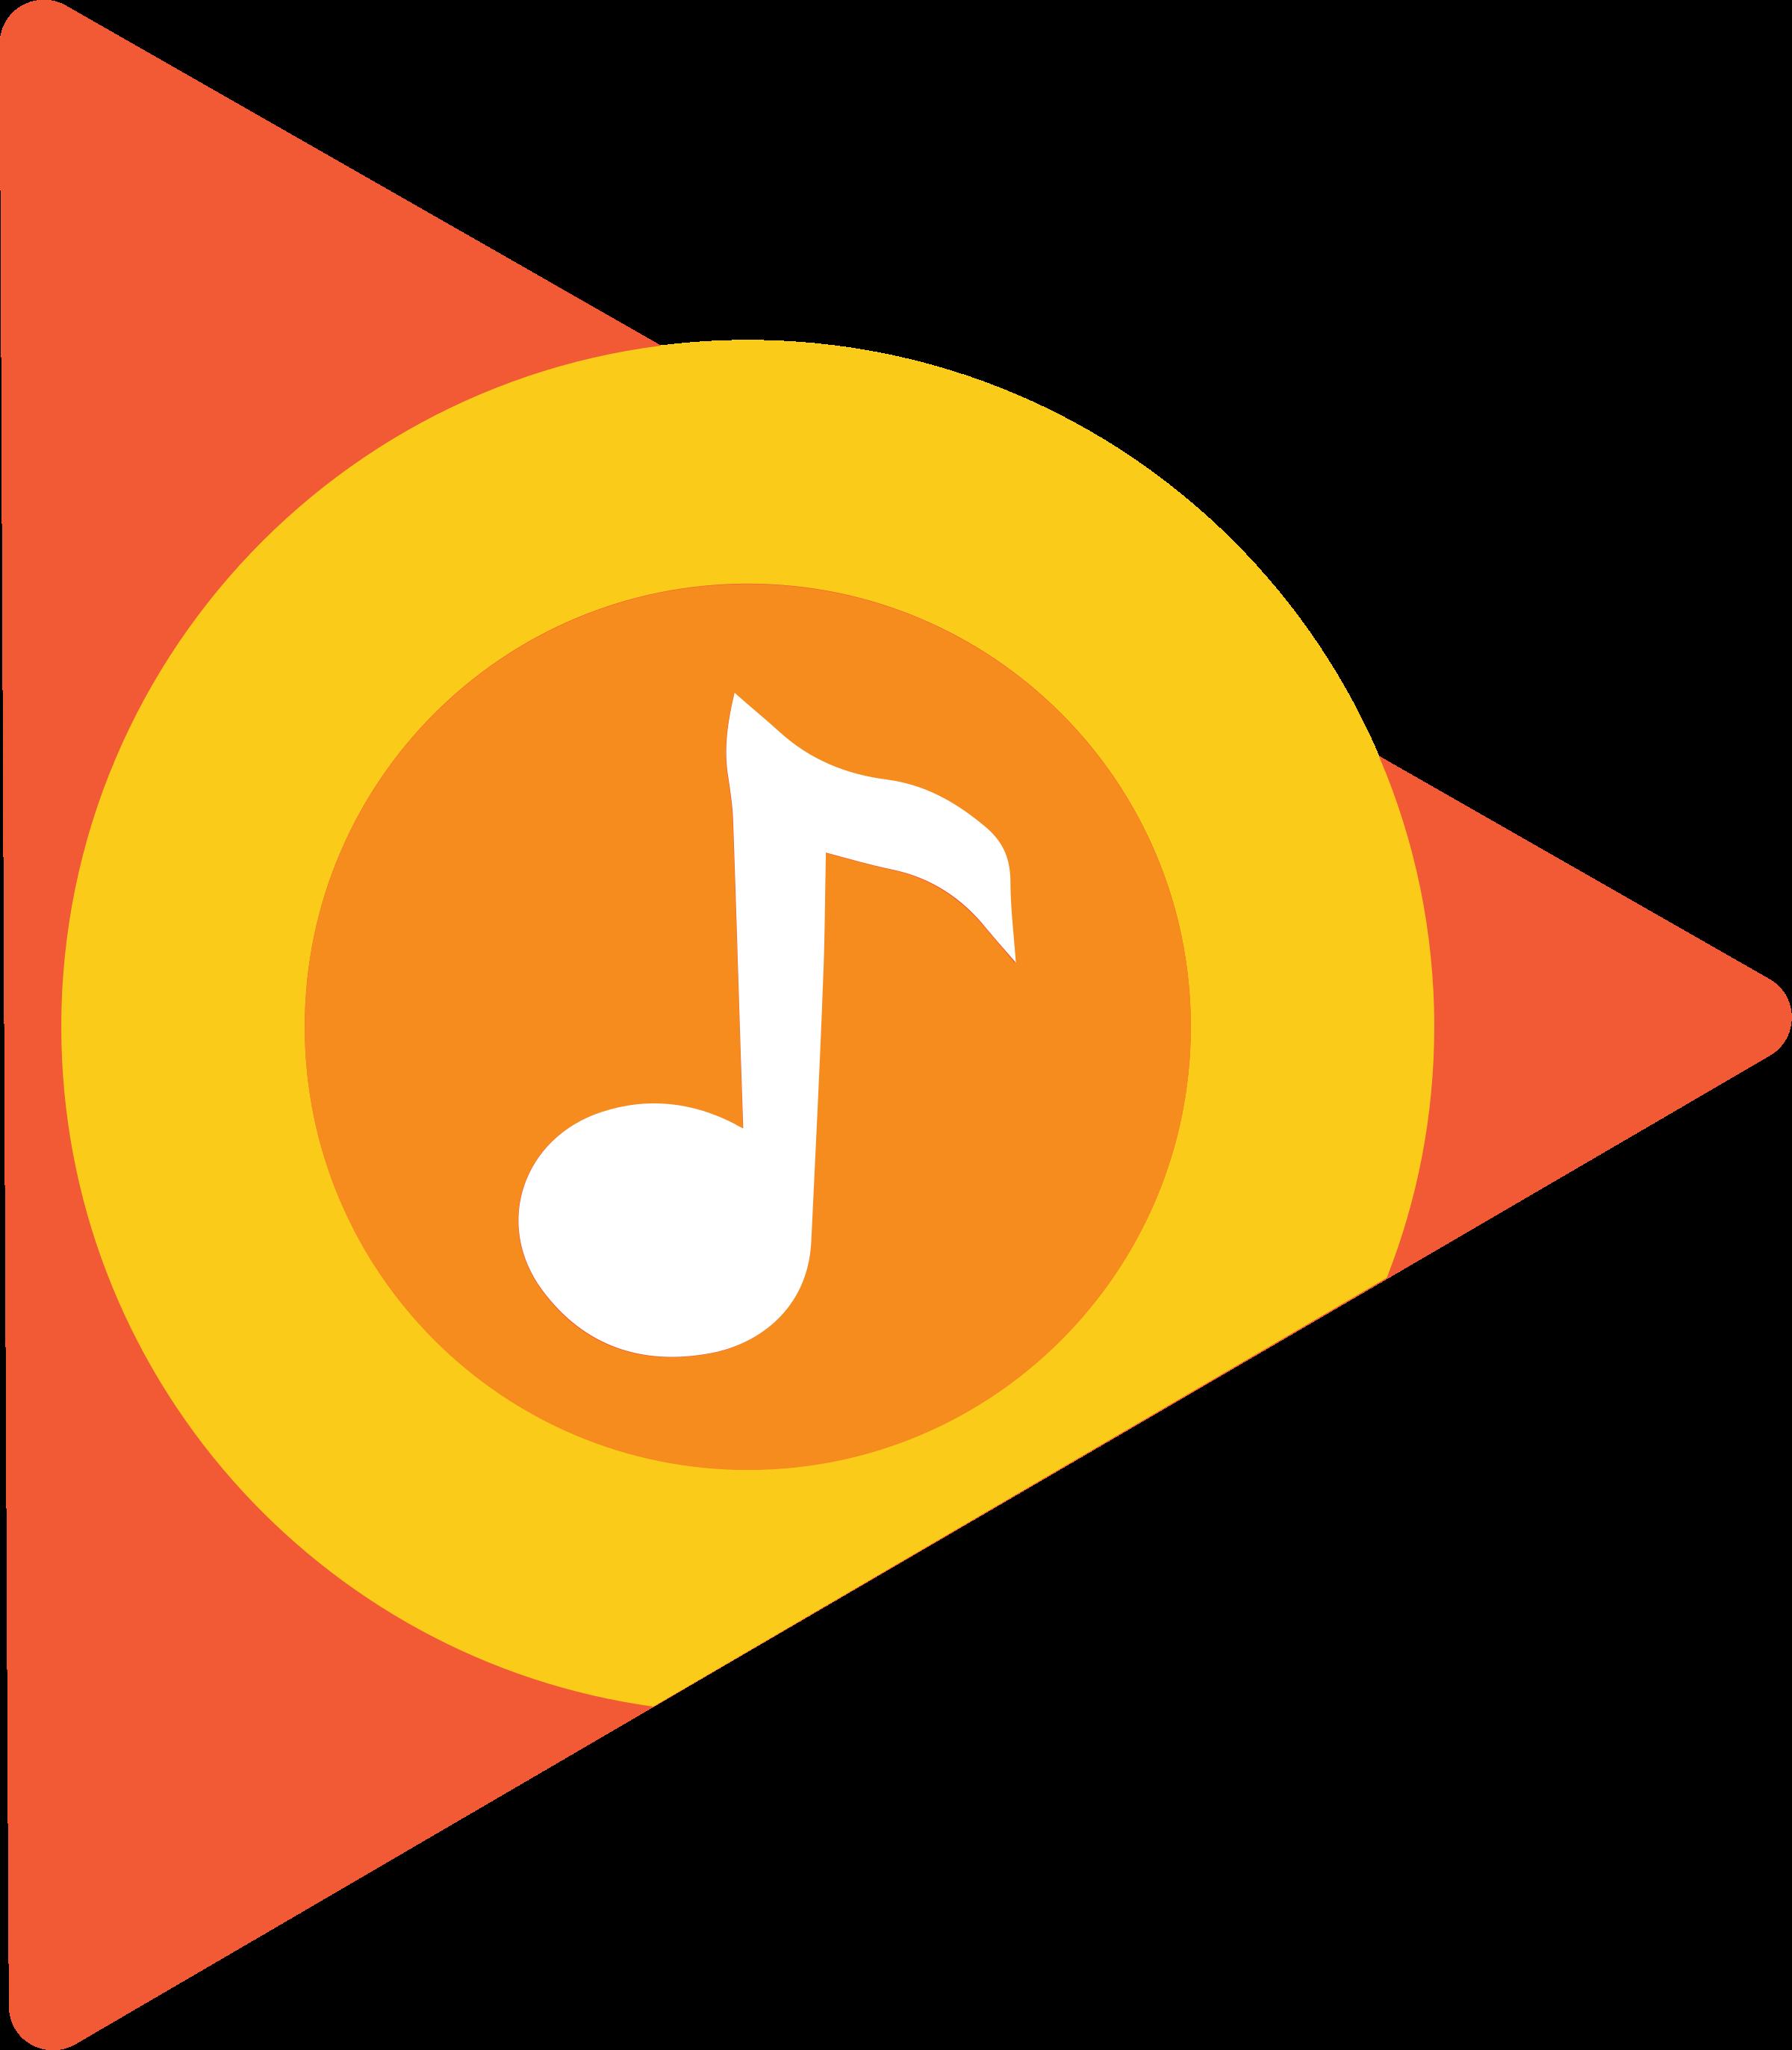 Google Play Music Logo Png Transparent Svg Vector Freebie Supply